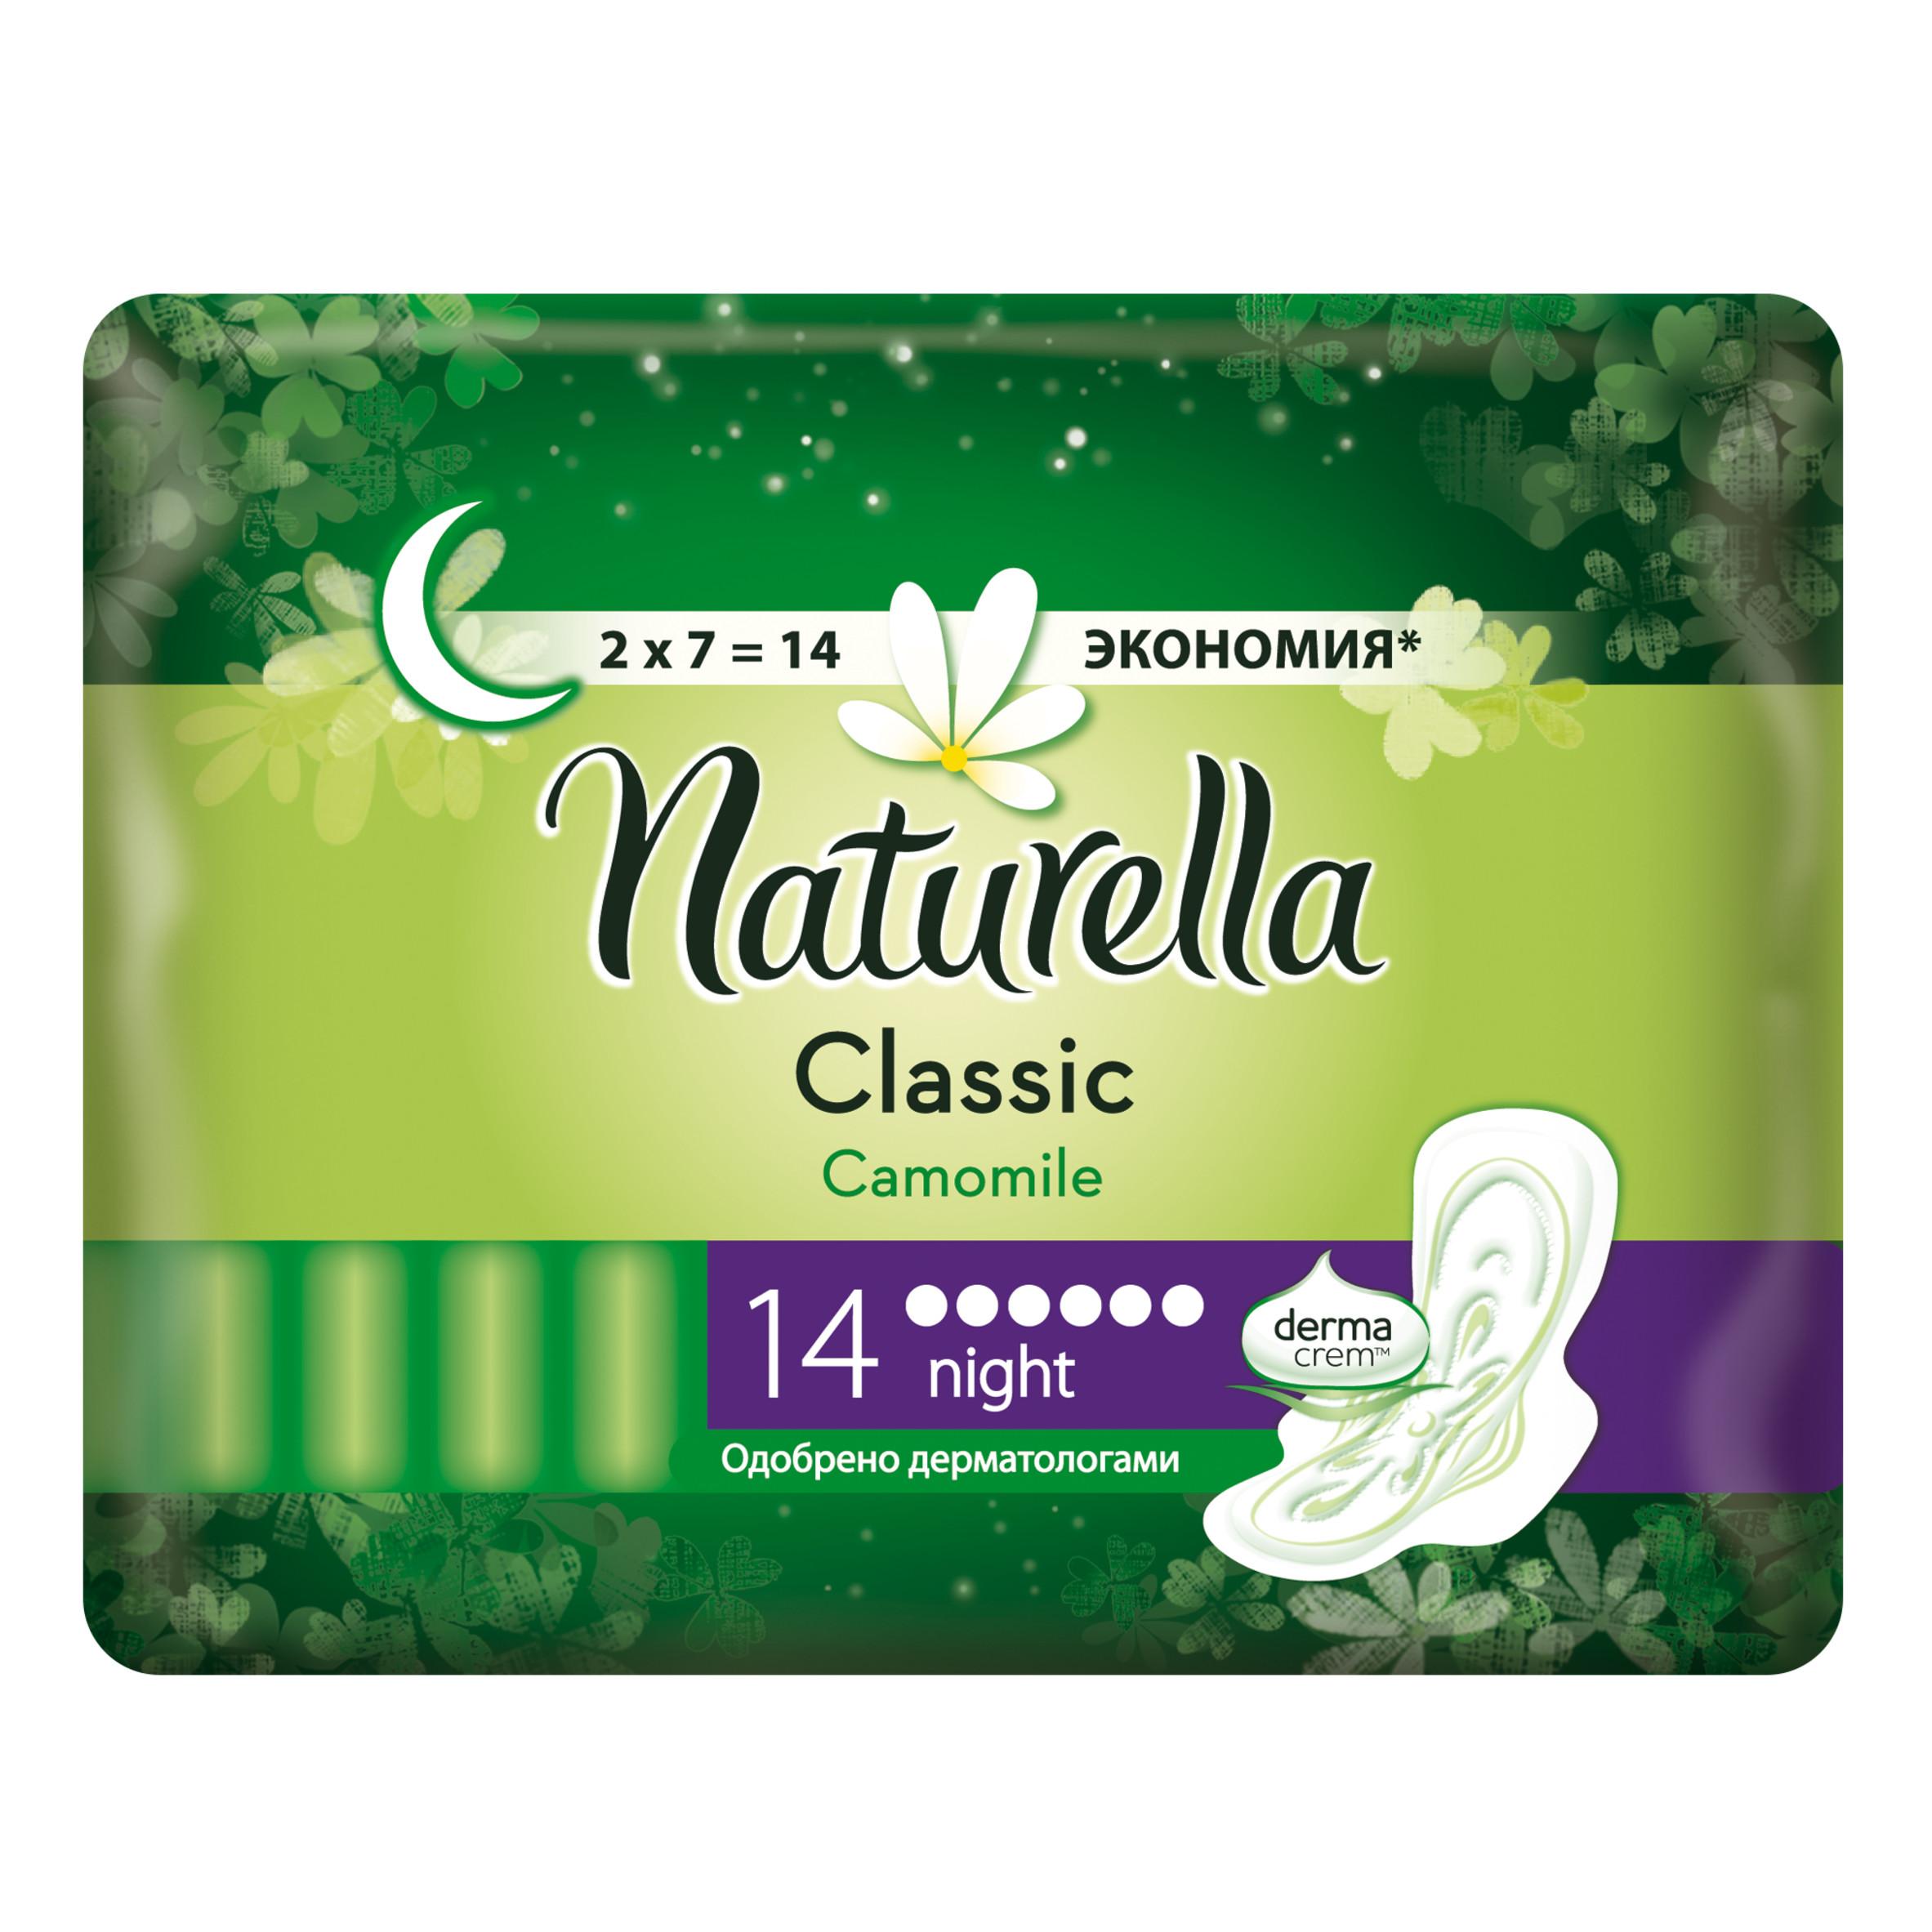 Прокладки гигиенические Naturella Classic Night Camomile 14Шт.<br>